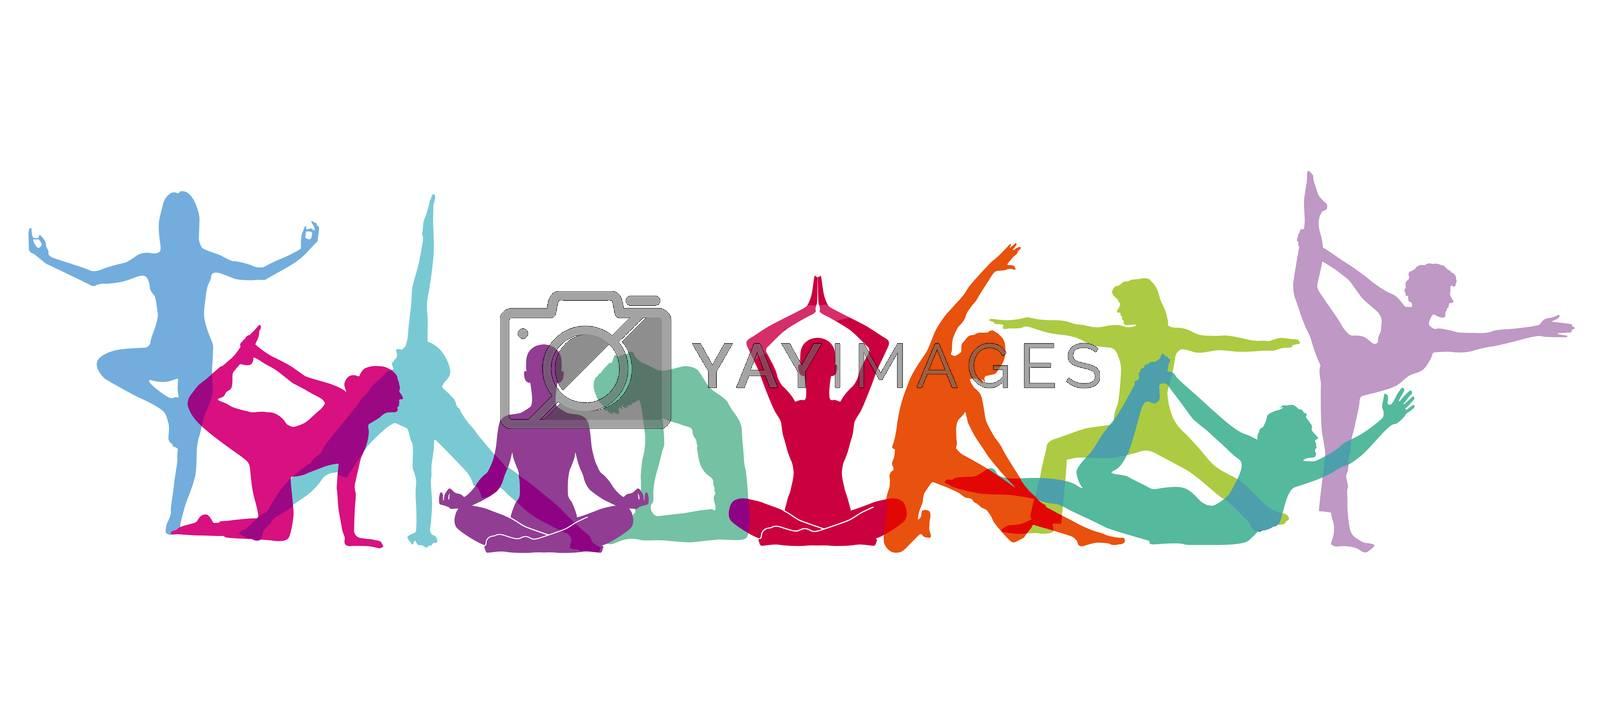 Yoga body figures composition